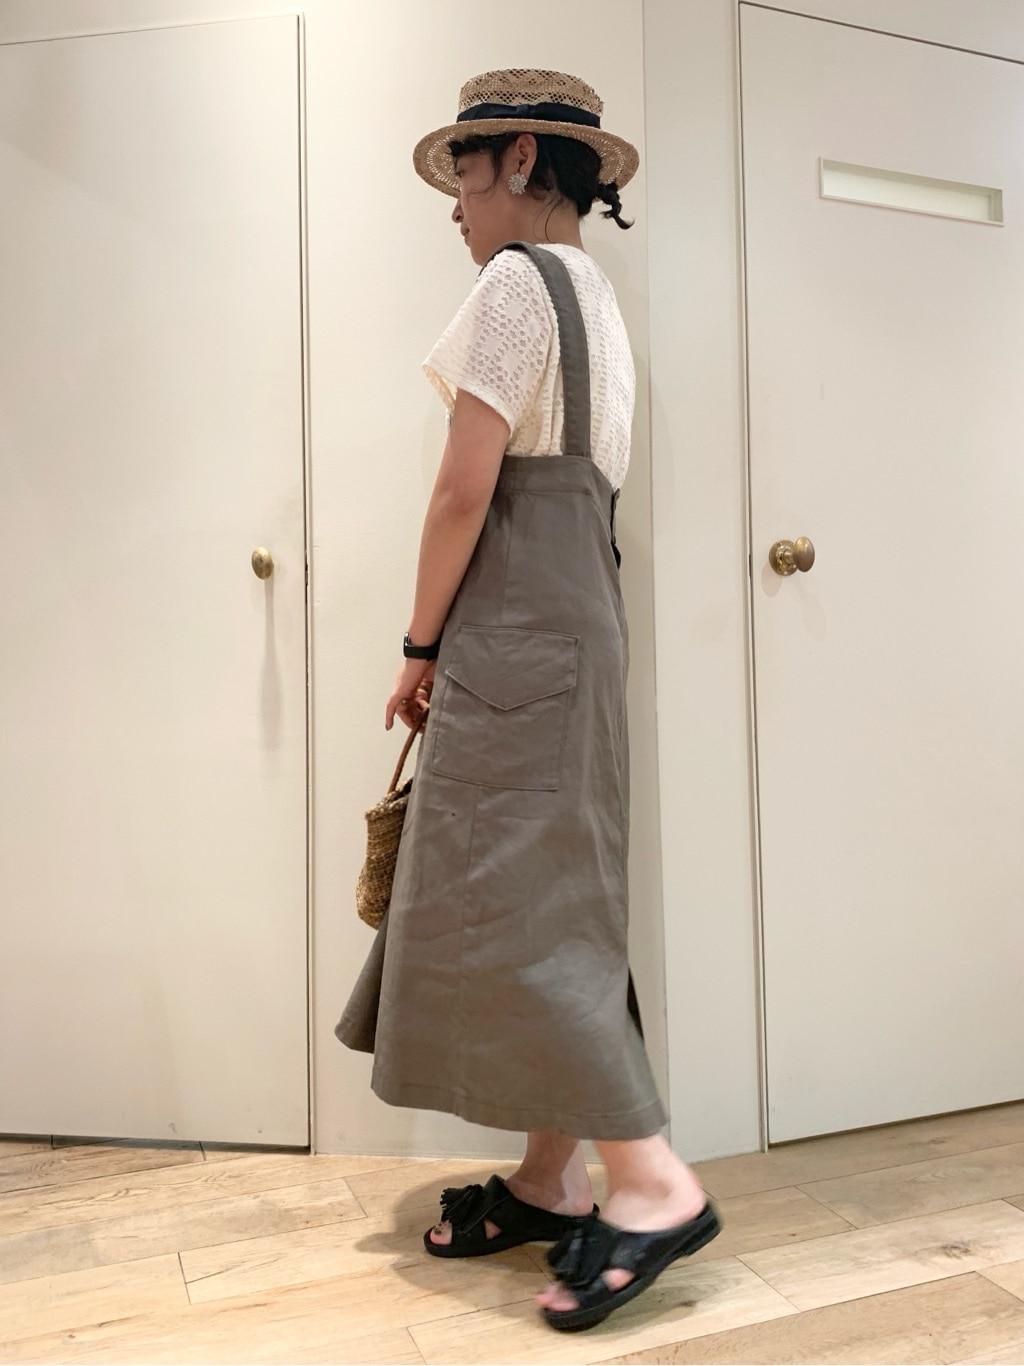 bulle de savon 新宿ミロード 身長:159cm 2020.08.15